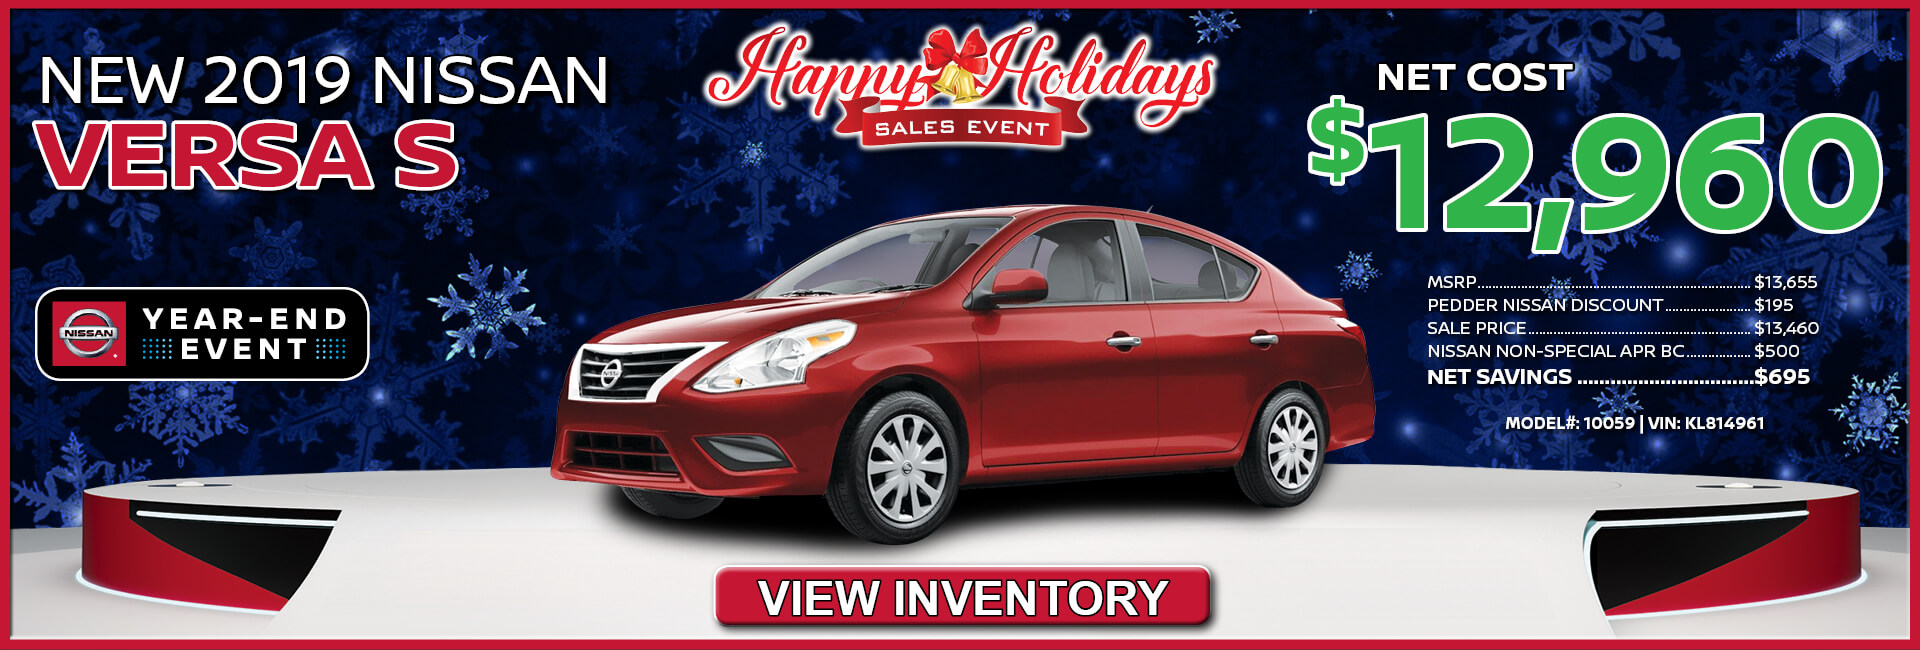 Nissan Versa $12,960